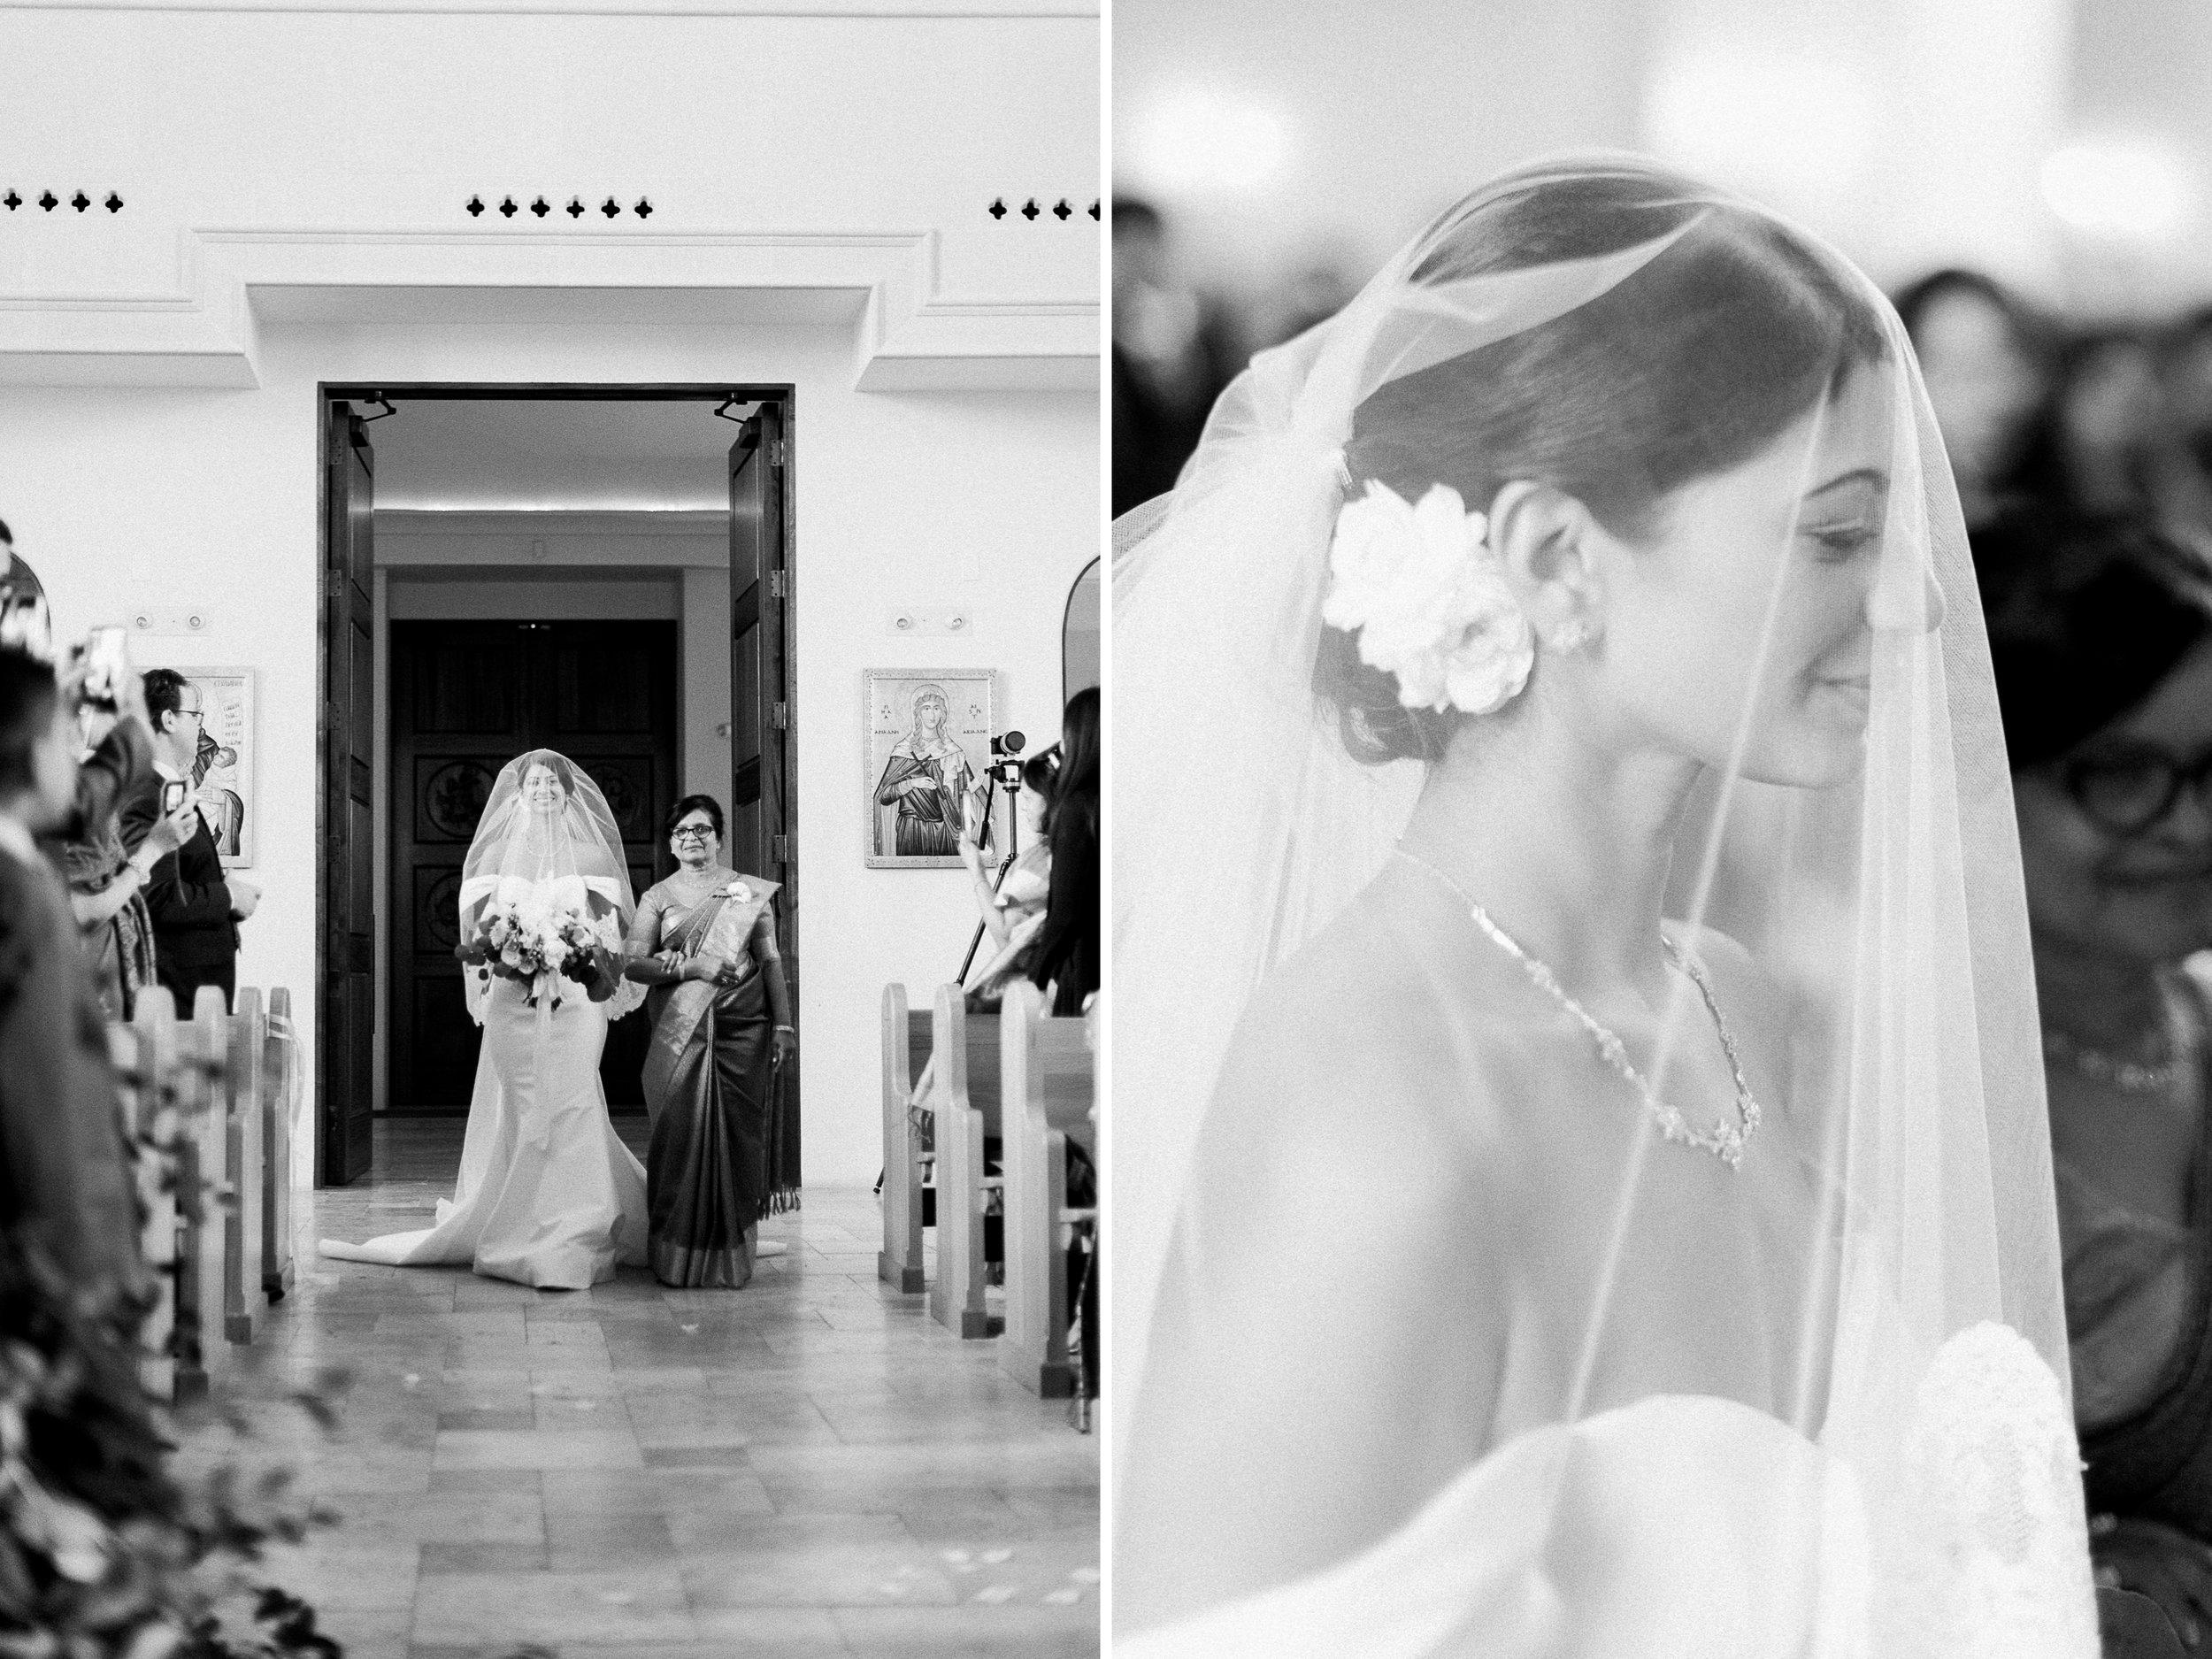 Fine-Art-Film-Houston-Wedding-Photographer-Best-Top-Luxury-Texas-Austin-Dallas-Destination-Dana-Fernandez-Photography-The-Bell-Tower-on-34th-Indian-9-106.jpg